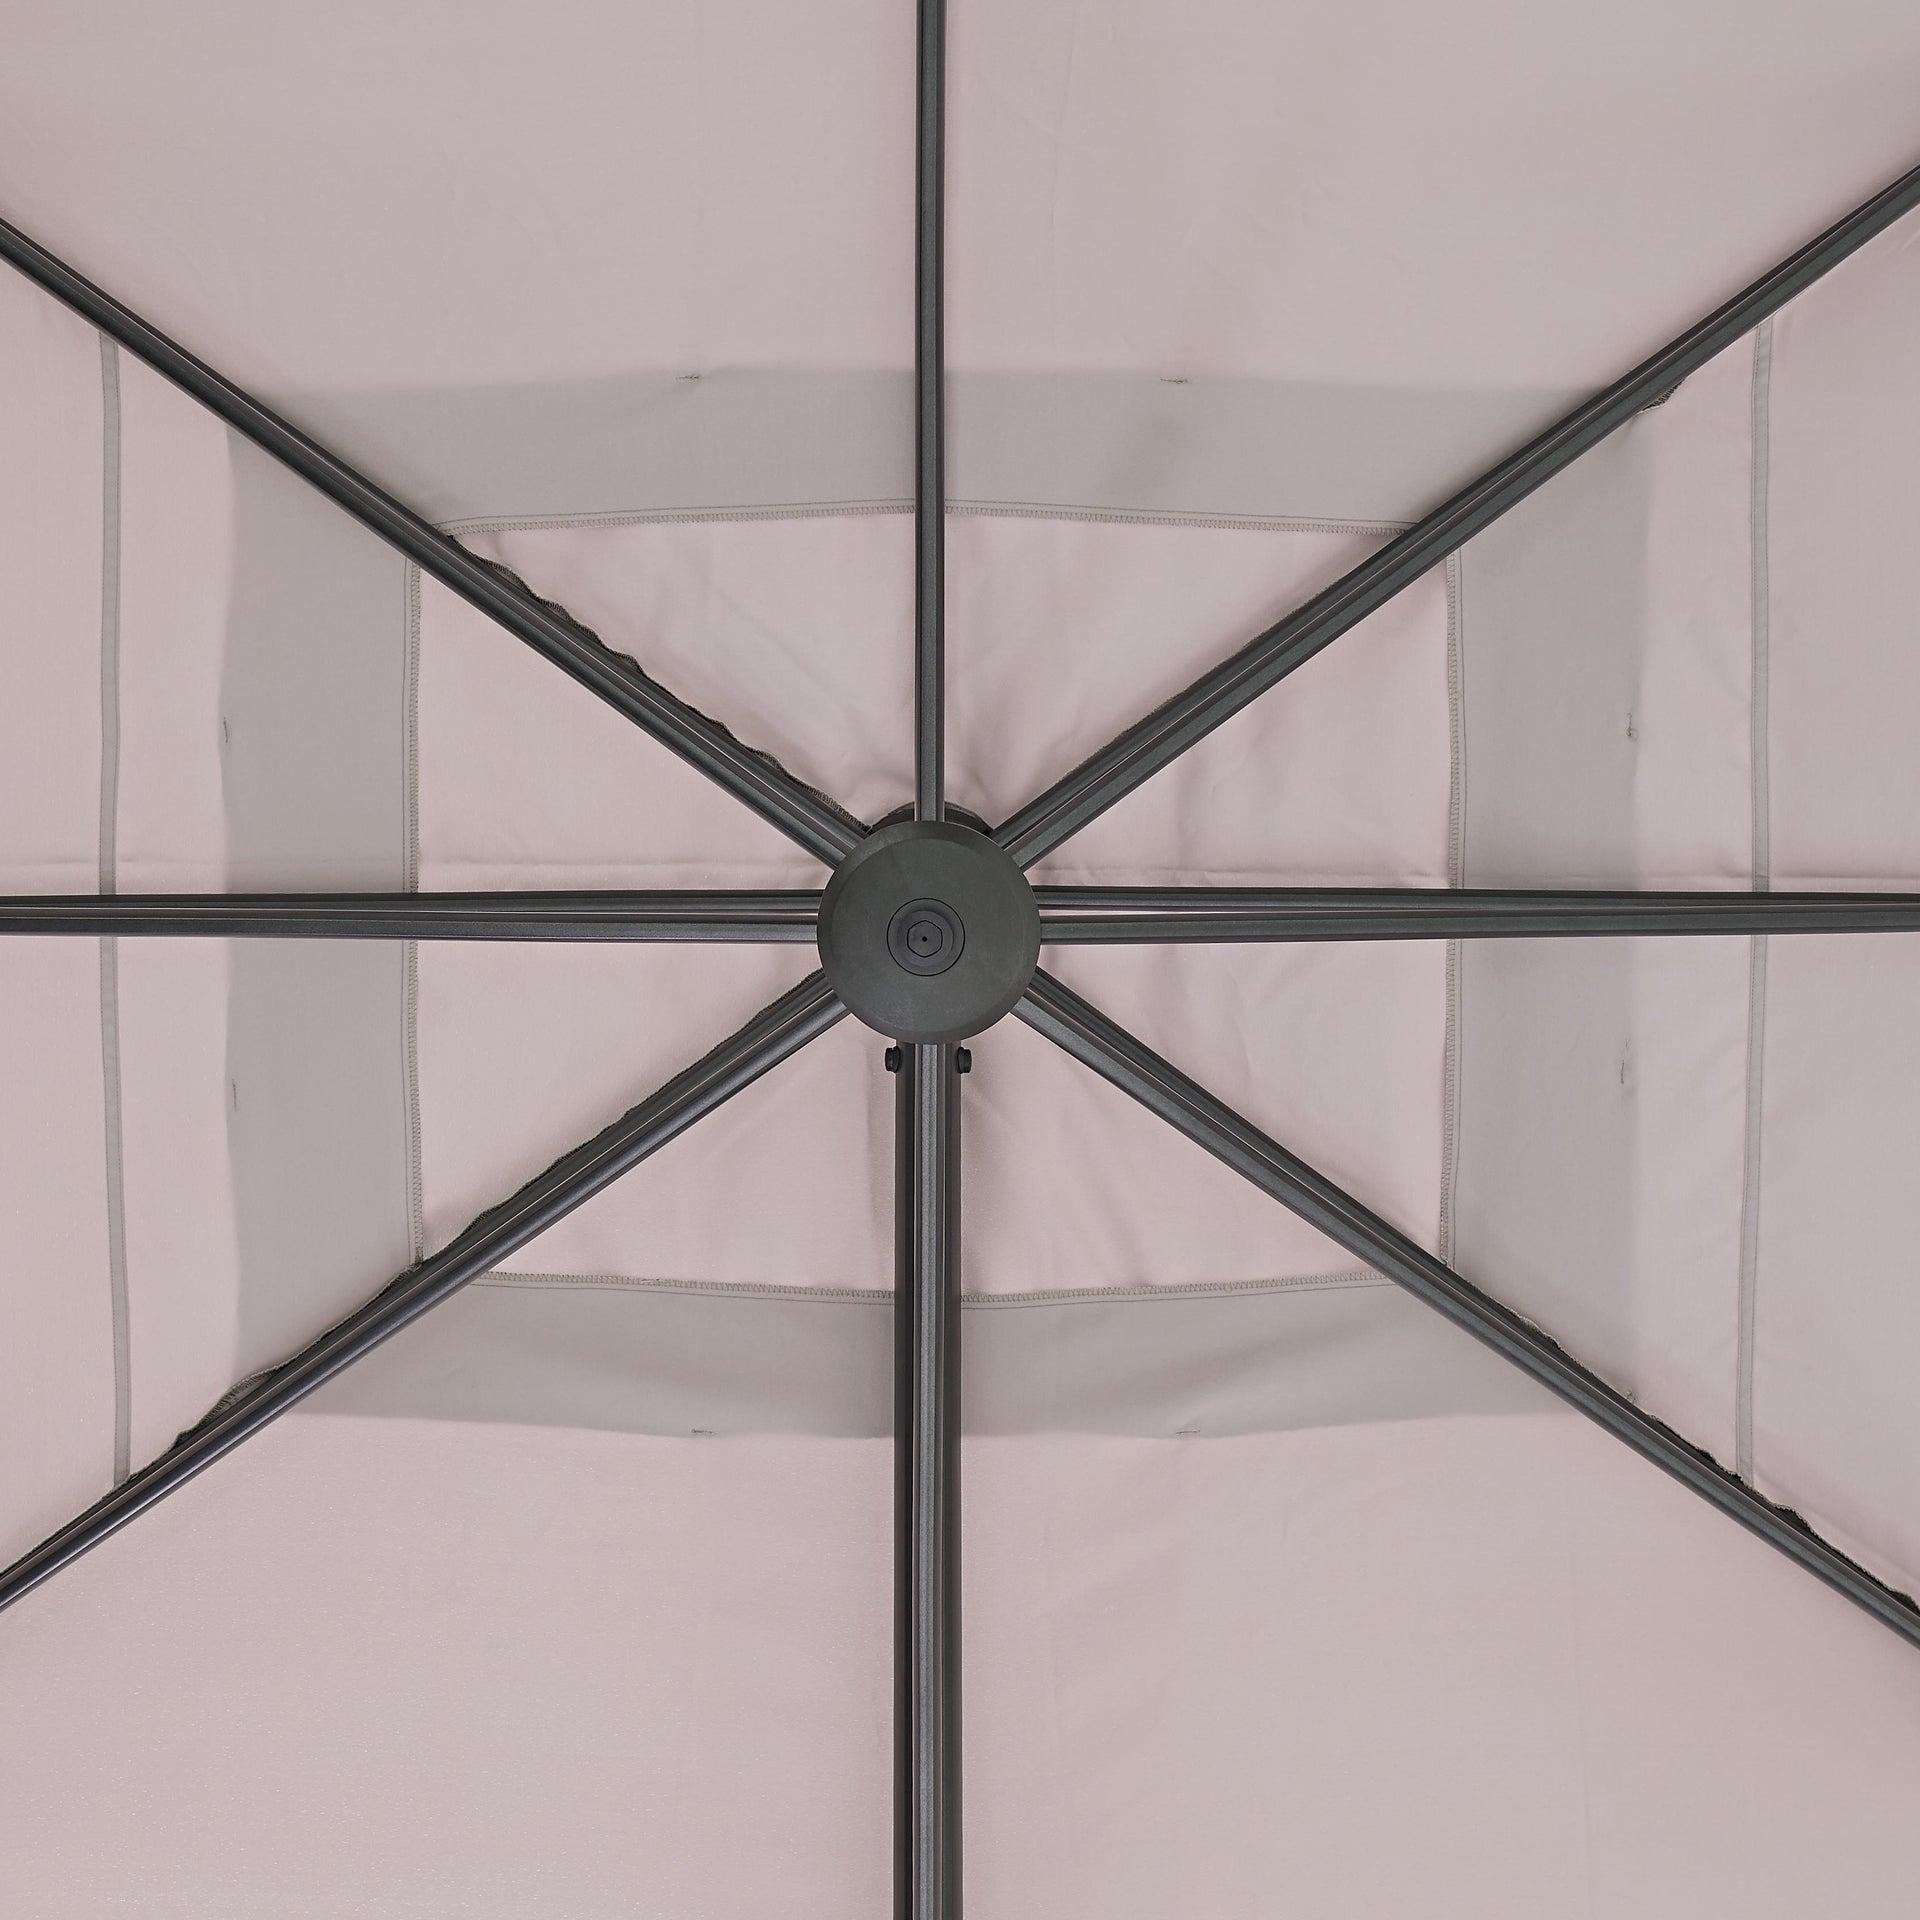 Ombrellone NATERIAL Aura L 2.81 x P 3.86 m color tortora - 15